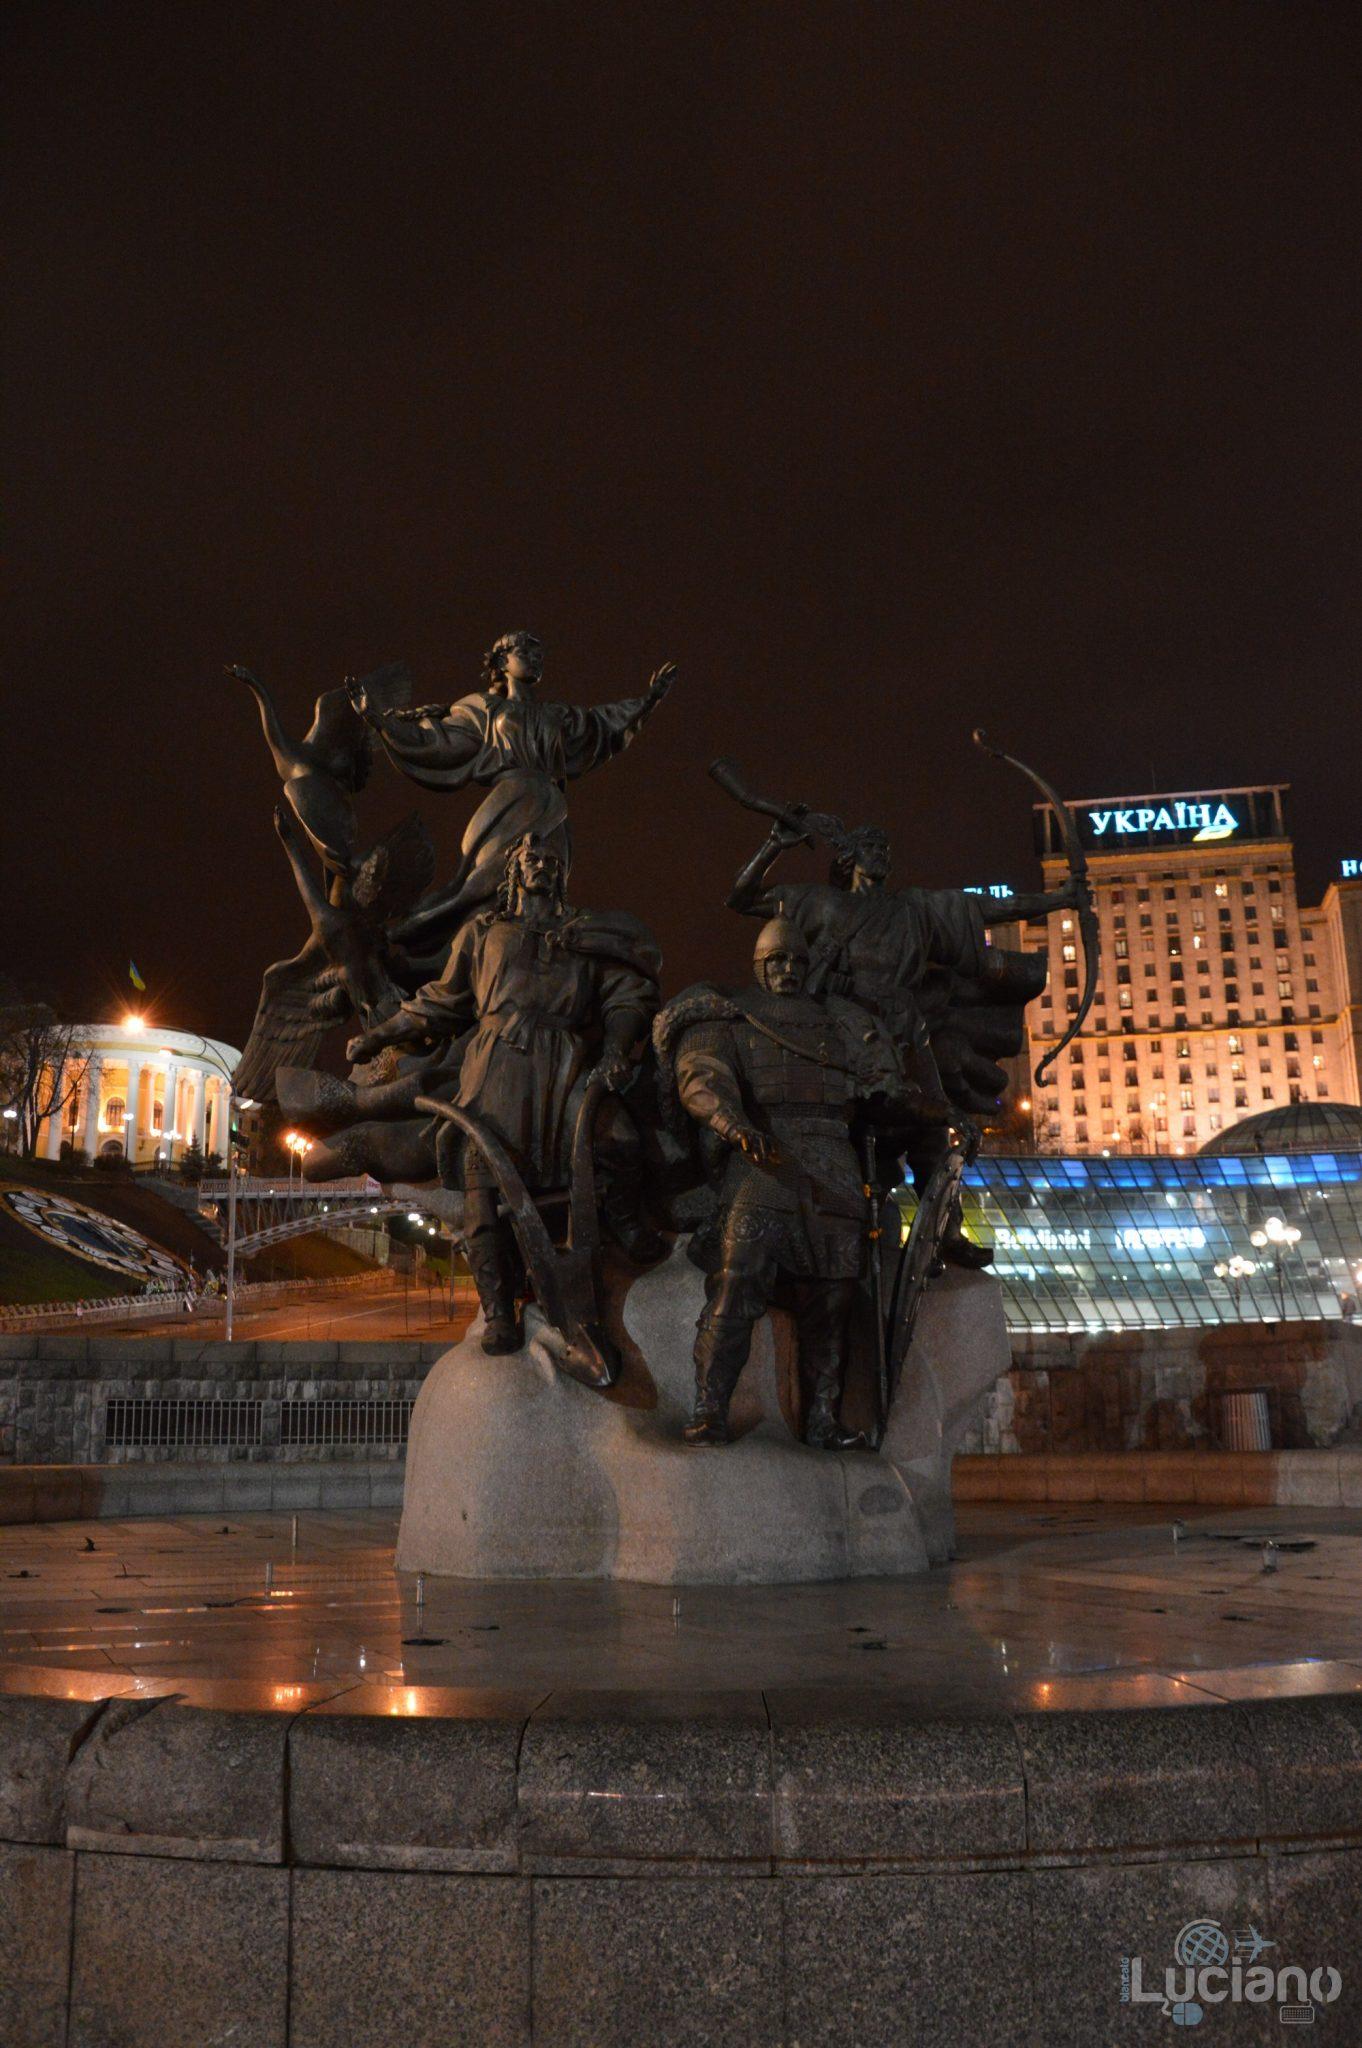 kiev-luciano-blancato-web-site (18)